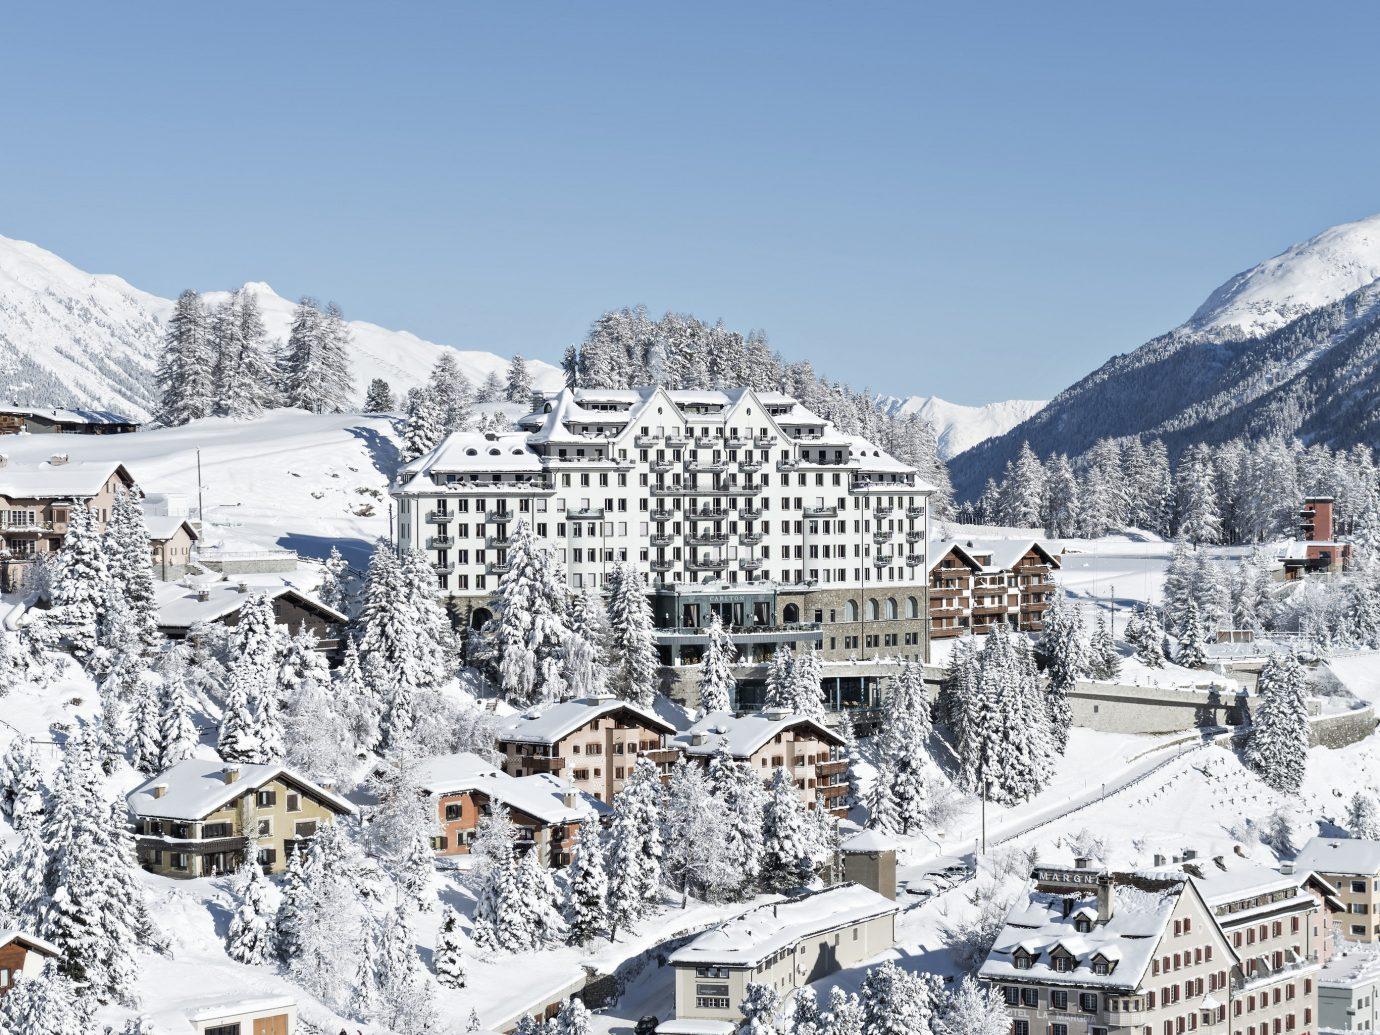 Exterior of Carlton Hotel St. Moritz